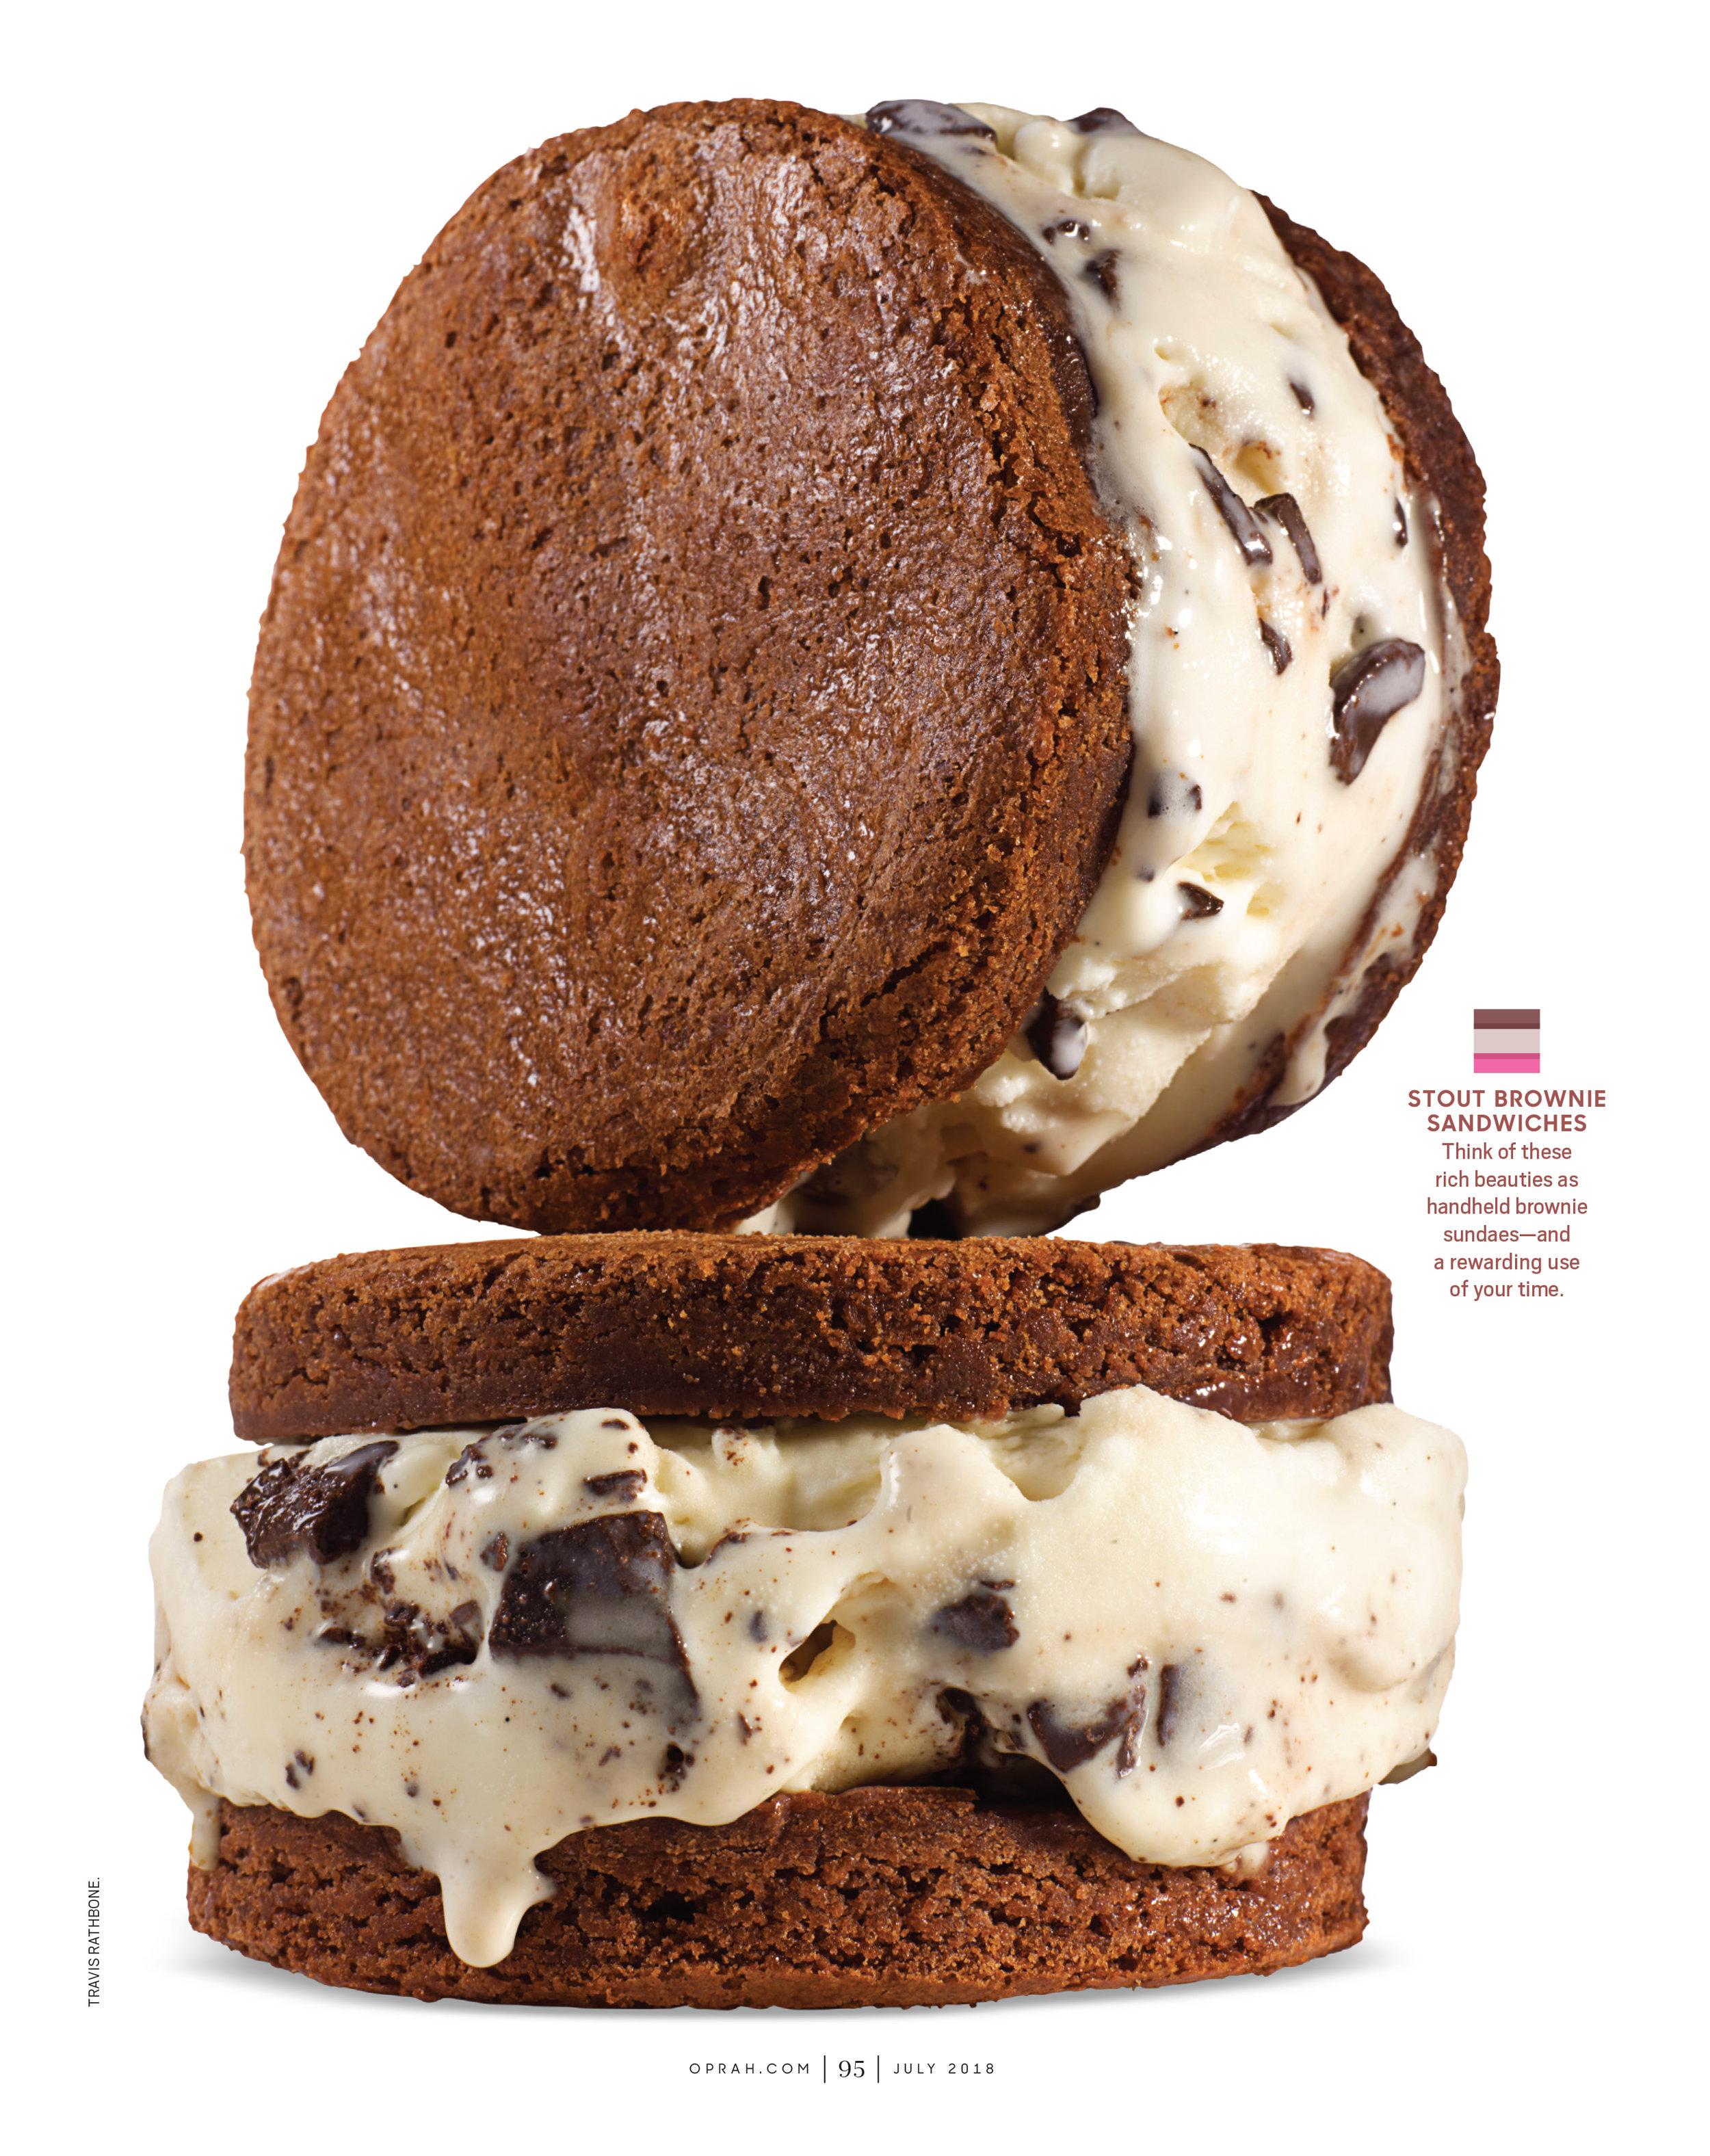 Stout Brownie Ice Cream Sandwiches by Judy Kim